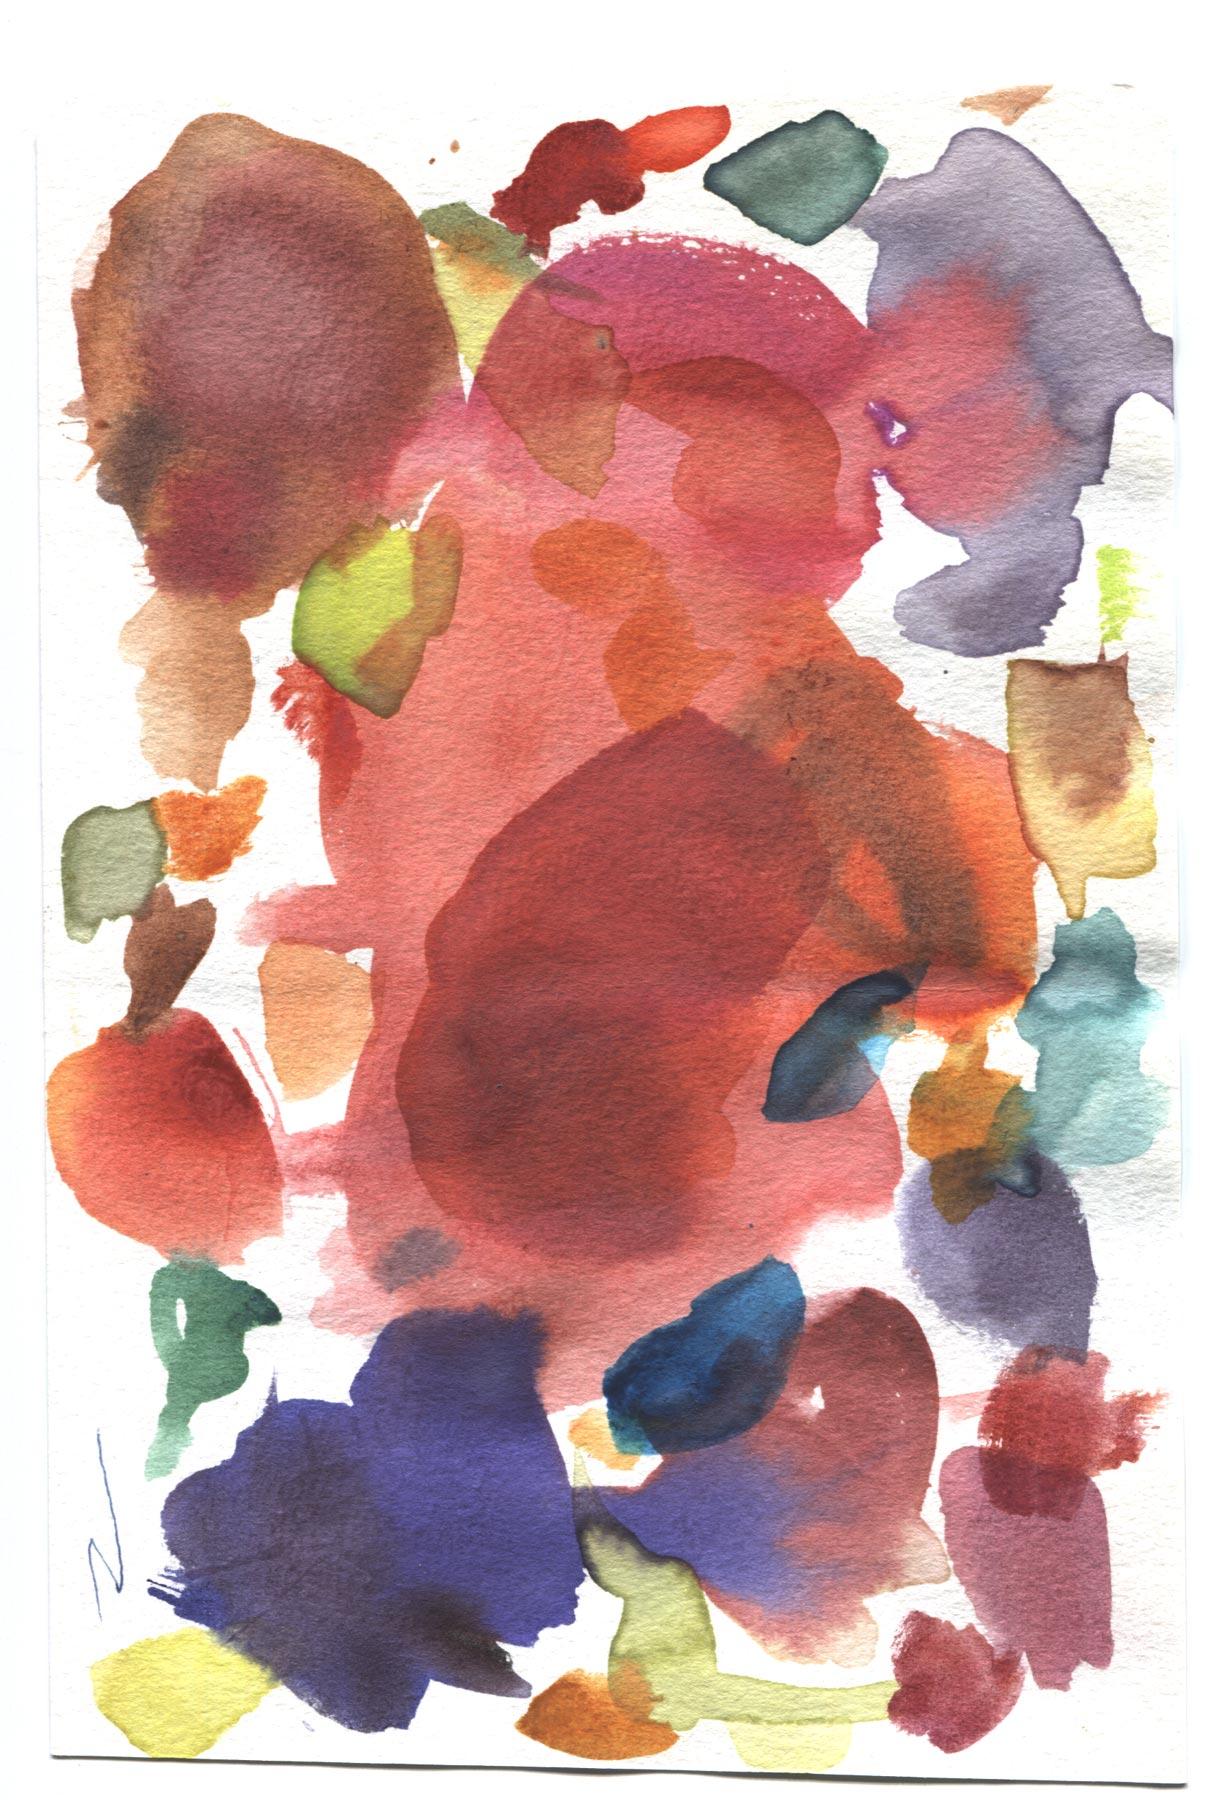 Seven Watercolor Paper Textures